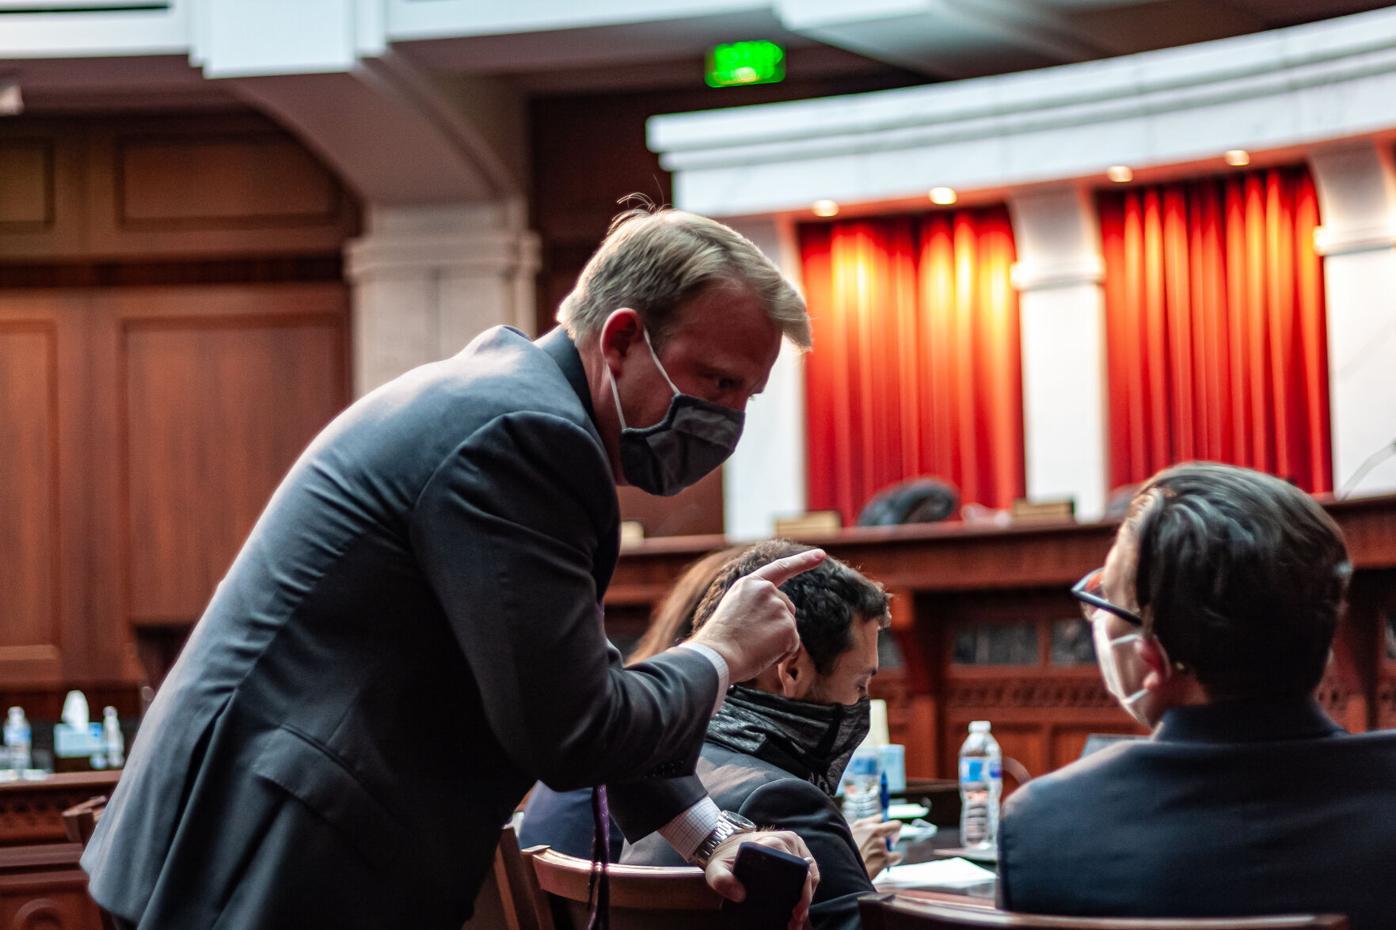 10-12-21 Colorado Congressional Redistricting Commission Supreme Court Oral Arguments 4